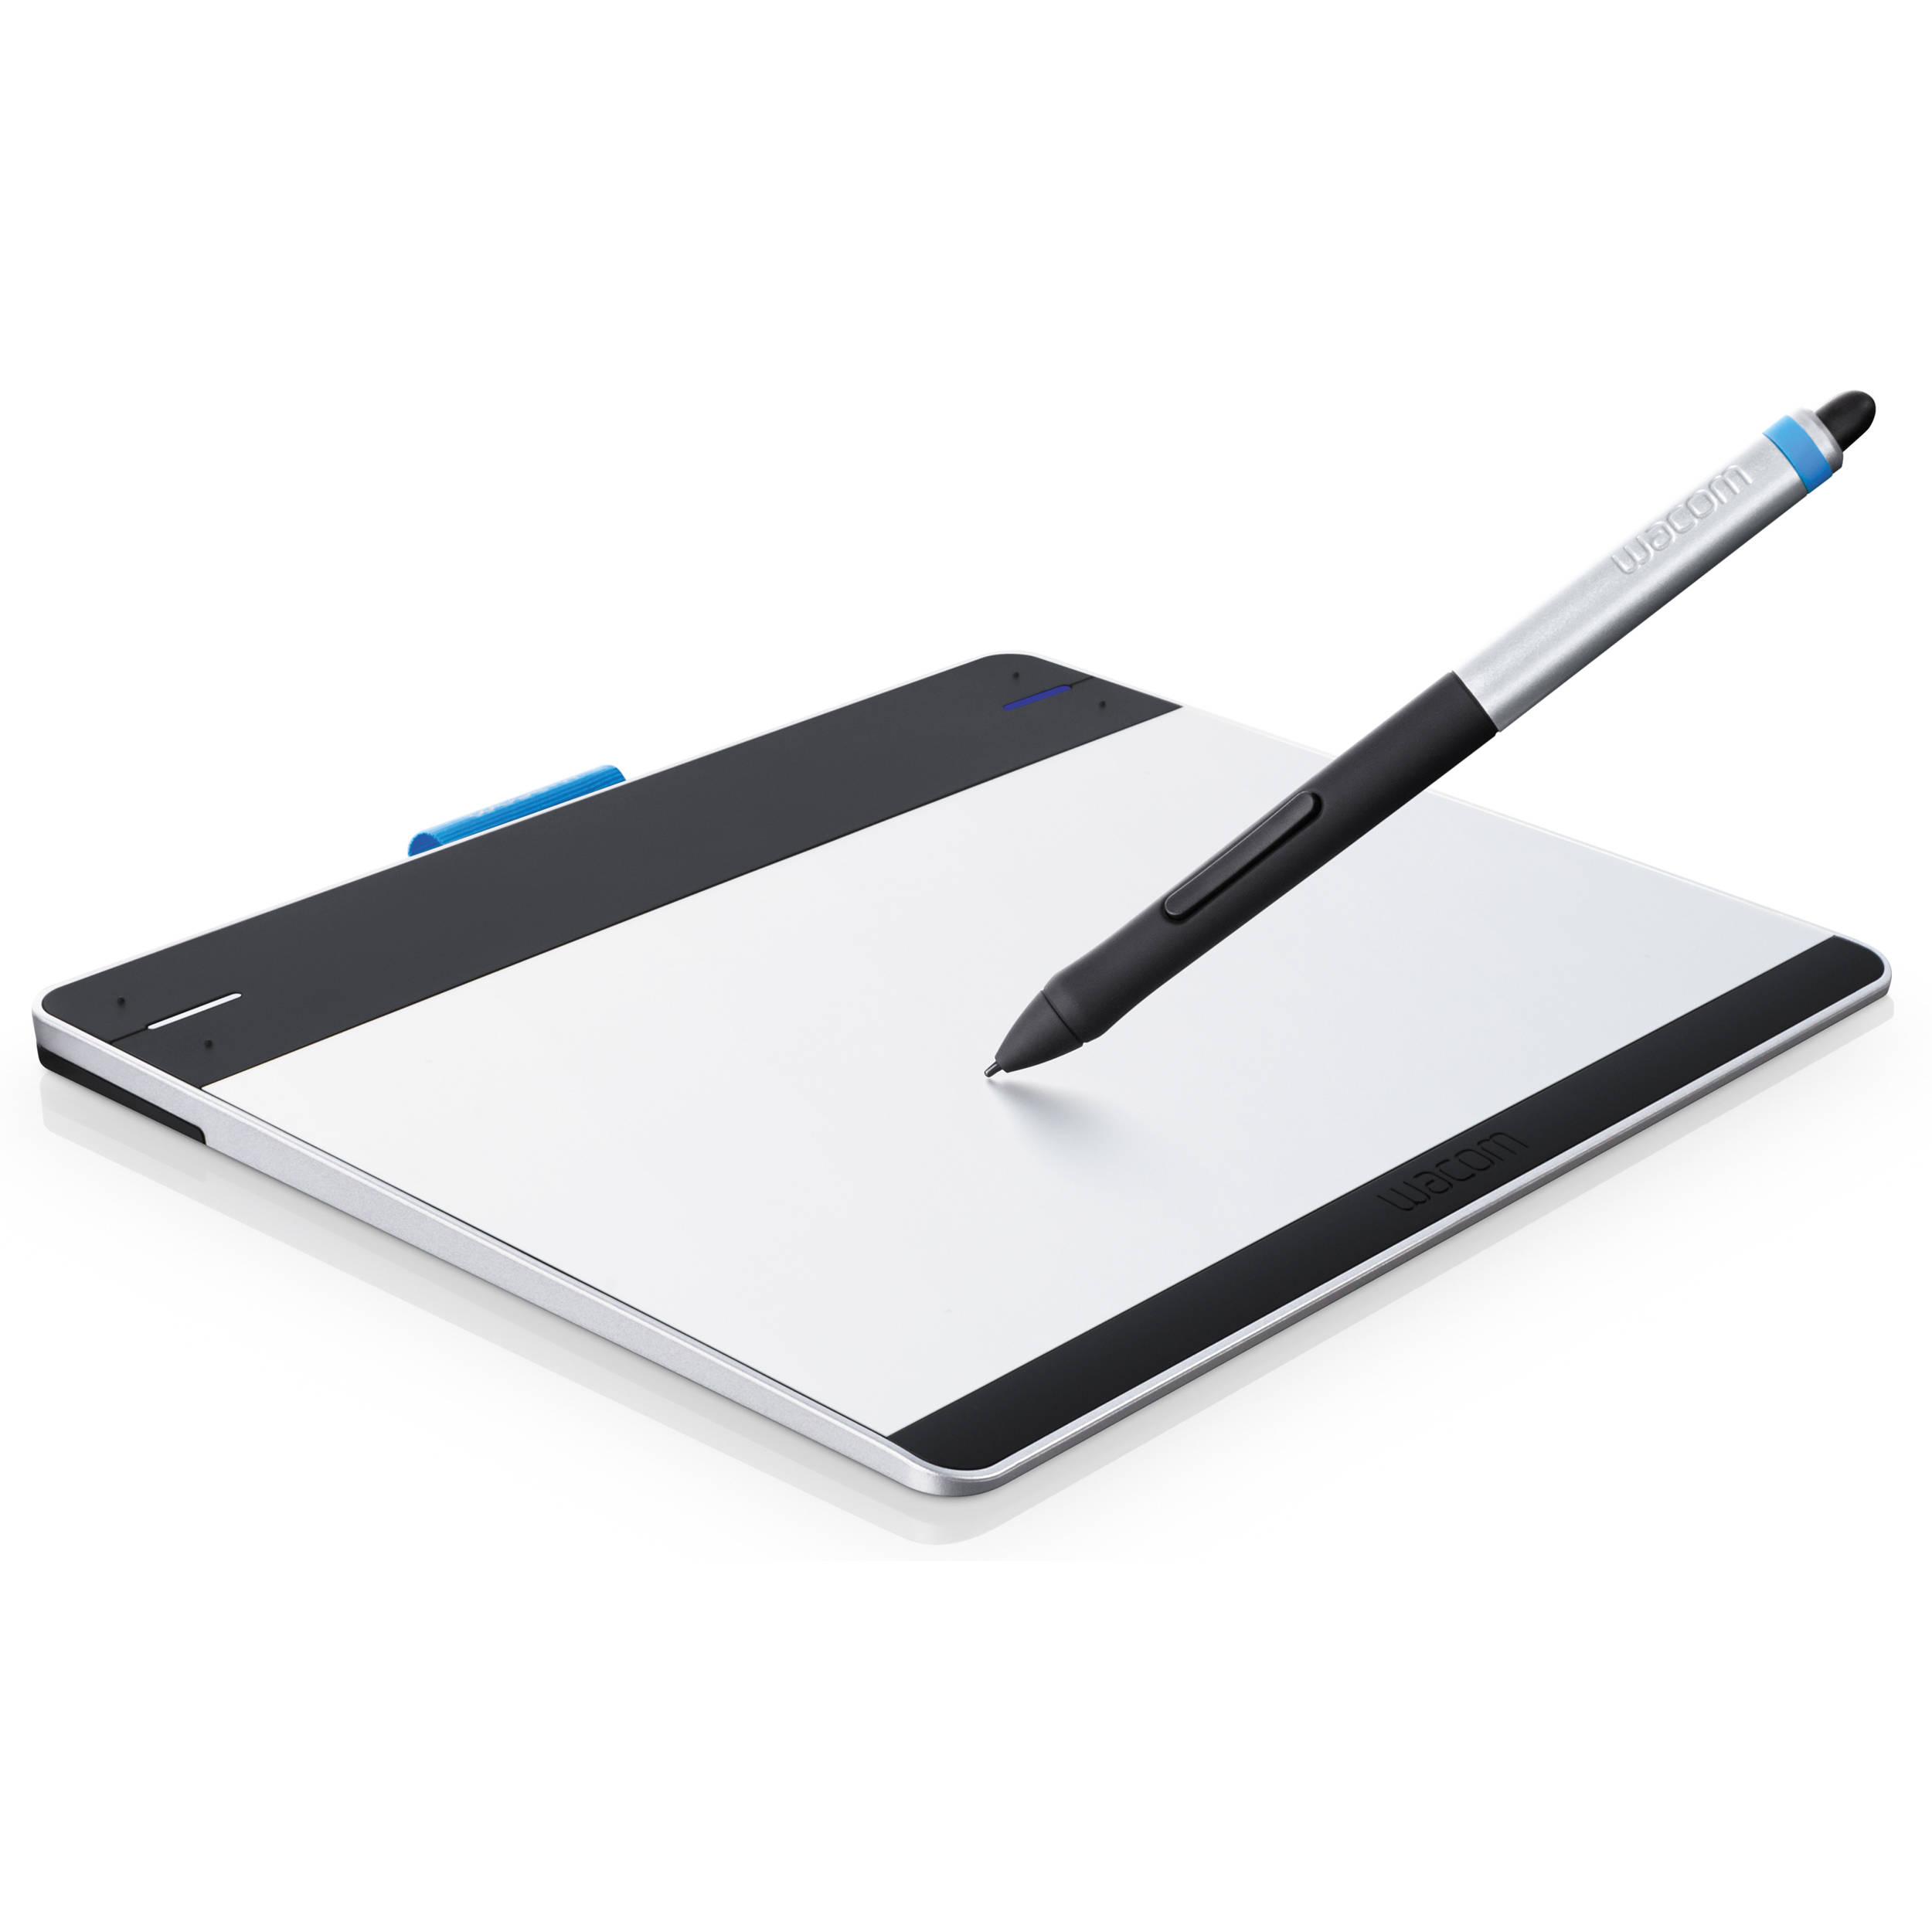 wacom intuos creative pen   touch tablet  small  cth480 b h clipart keystone mark clipart keyboard